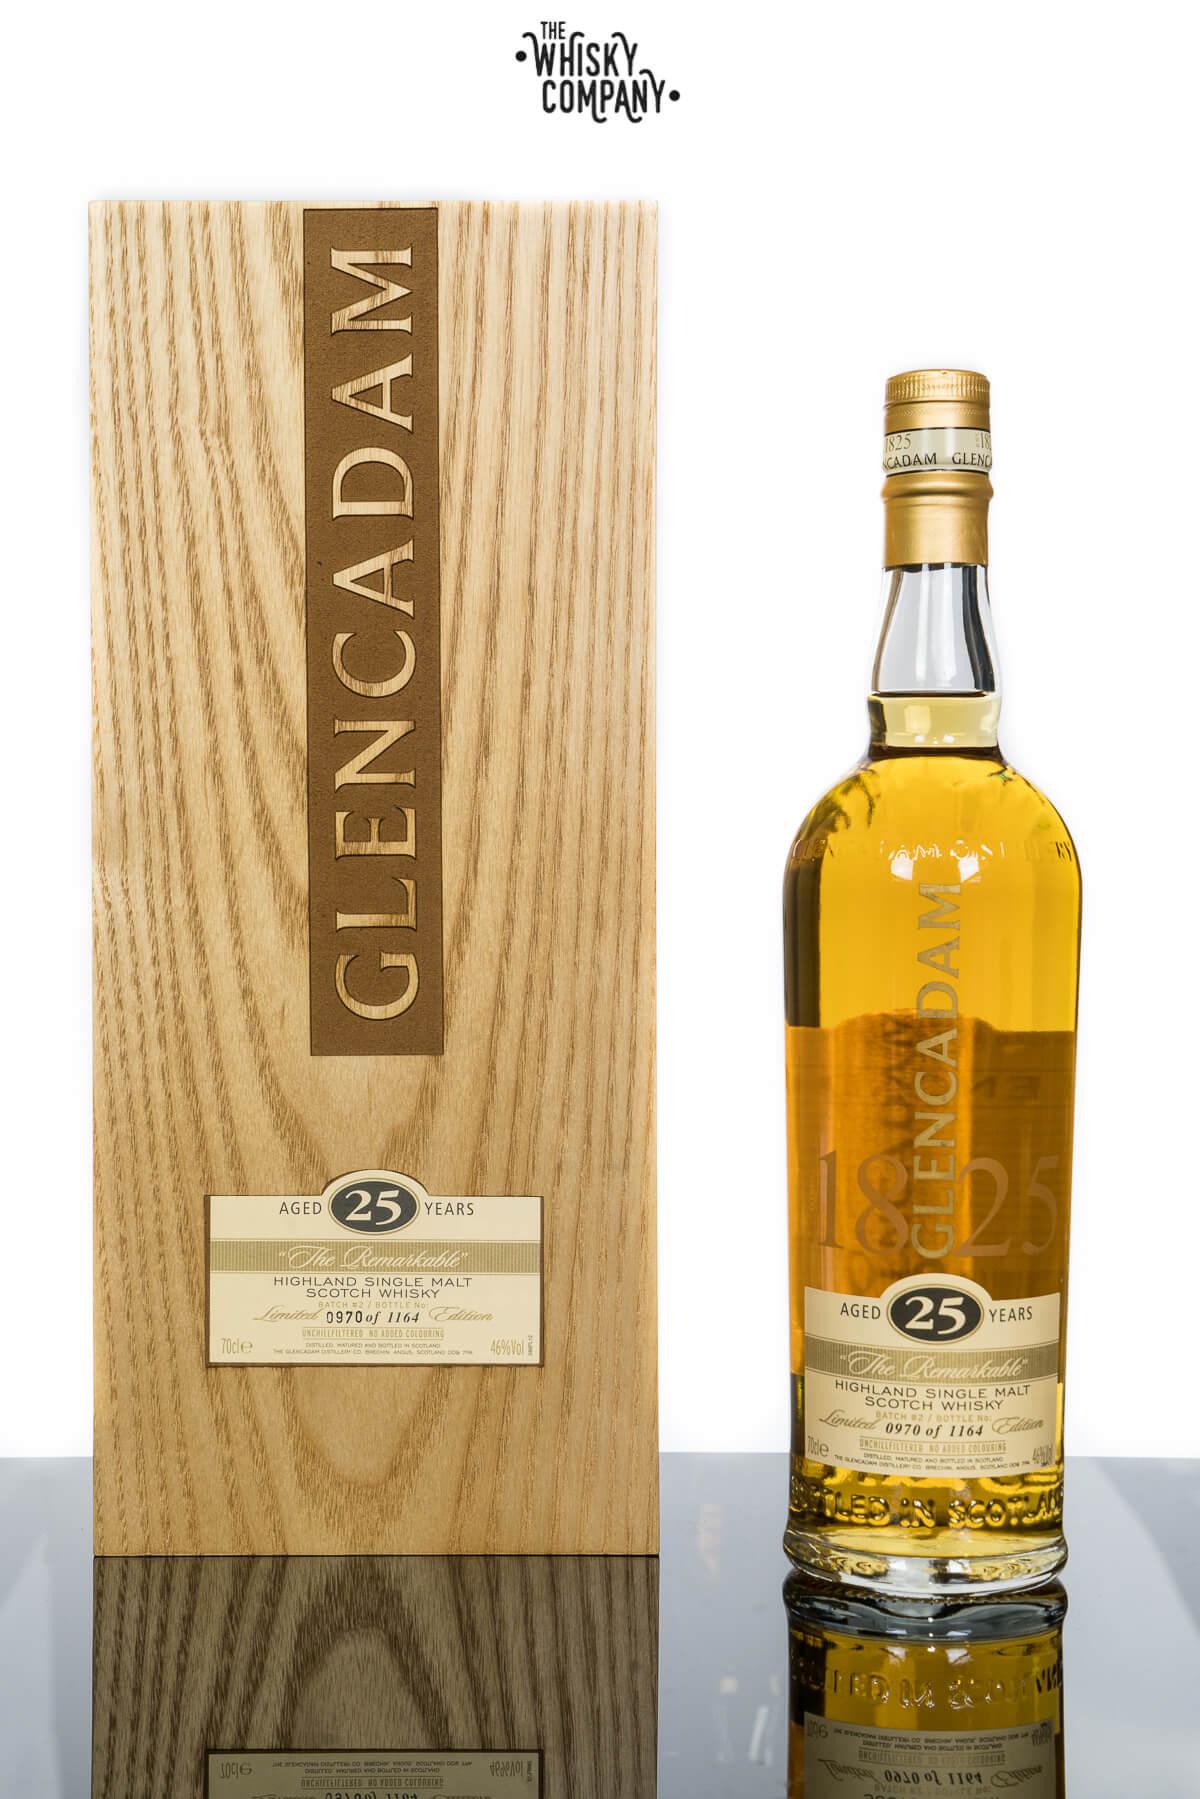 Glencadam 25 Years Old Highland Single Malt Scotch Whisky (700ml)